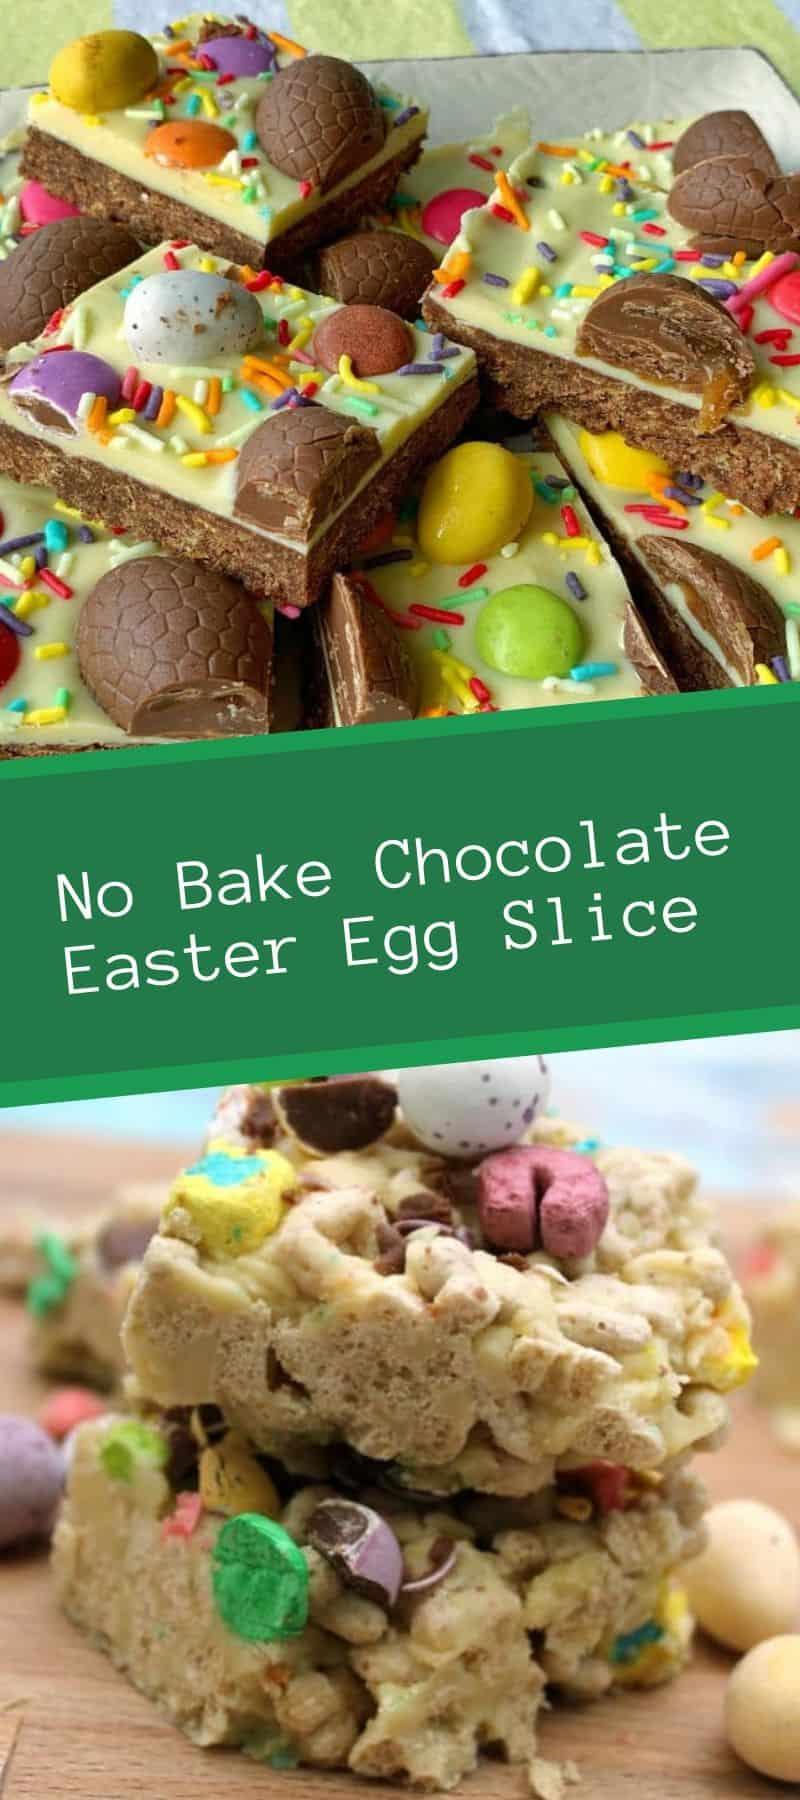 No Bake Chocolate Easter Egg Slice Recipe 3